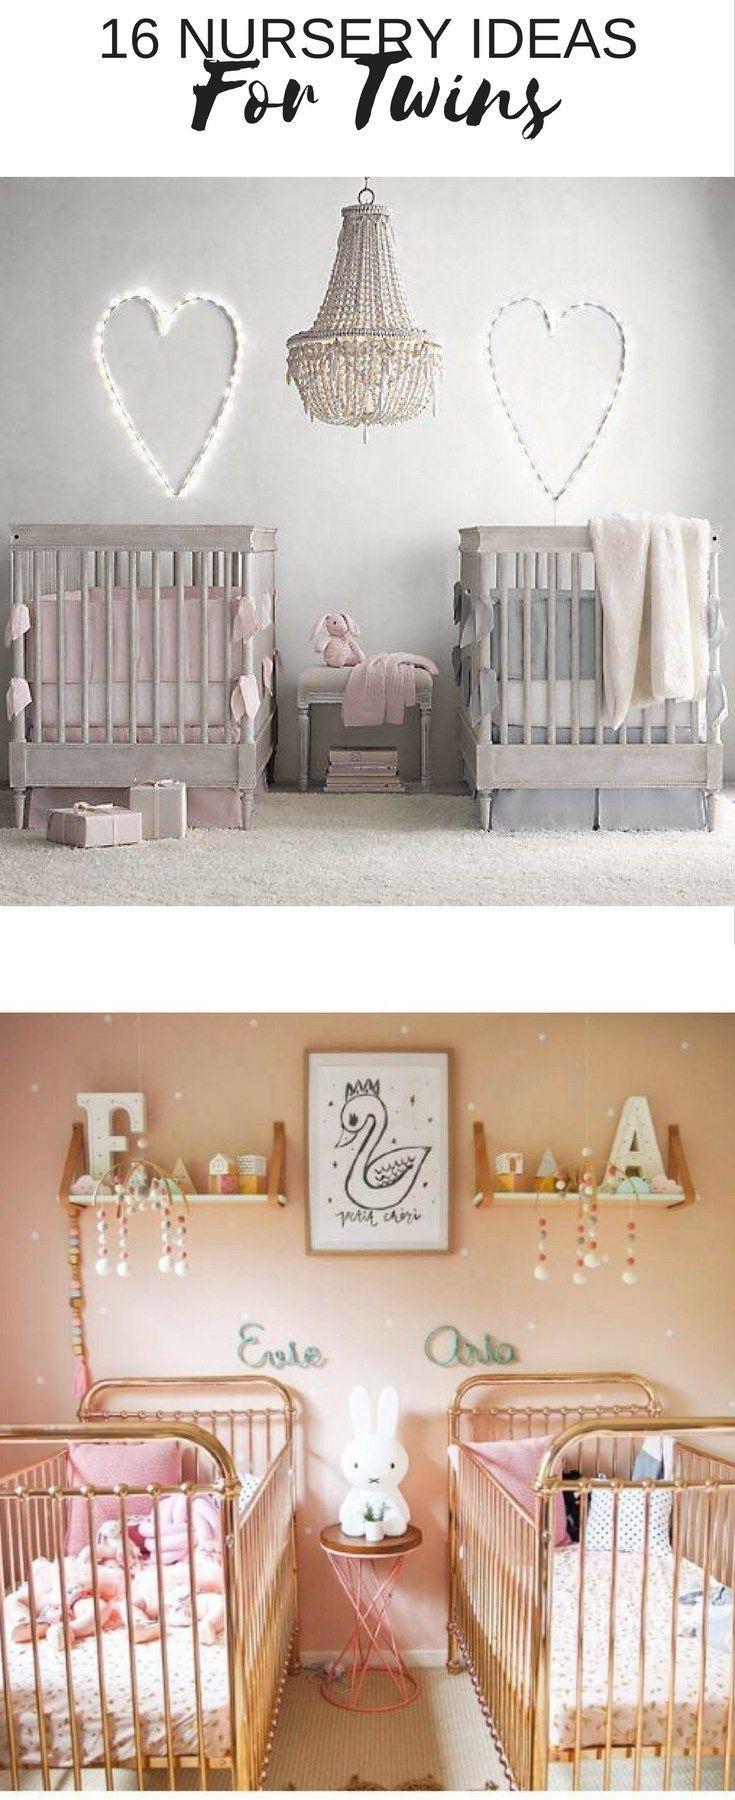 Twins Baby Room Decorating Ideas  17 Gorgeous Twin Nursery Ideas